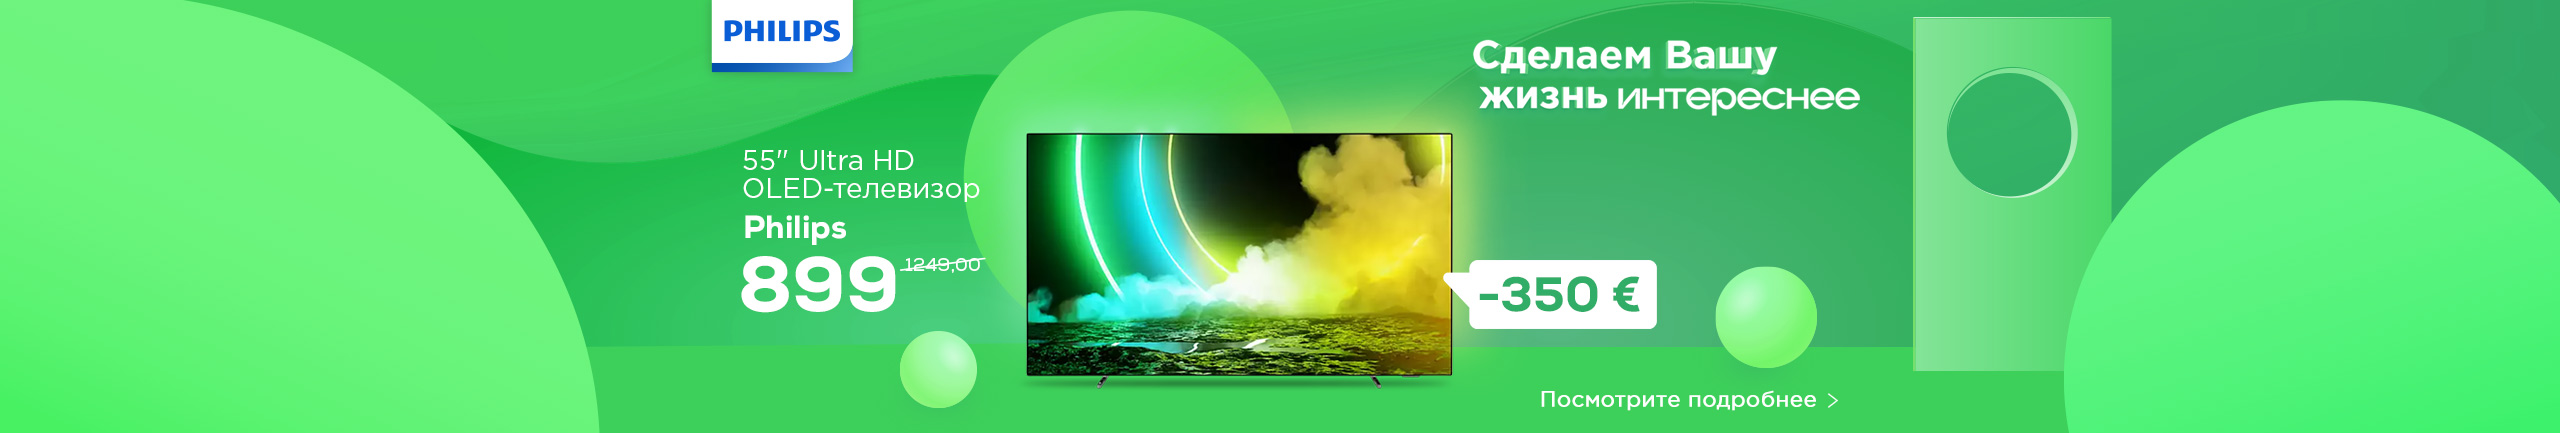 NPL  Сделаем Вашу жизнь проще! 55'' Ultra HD OLED-телевизор Philips